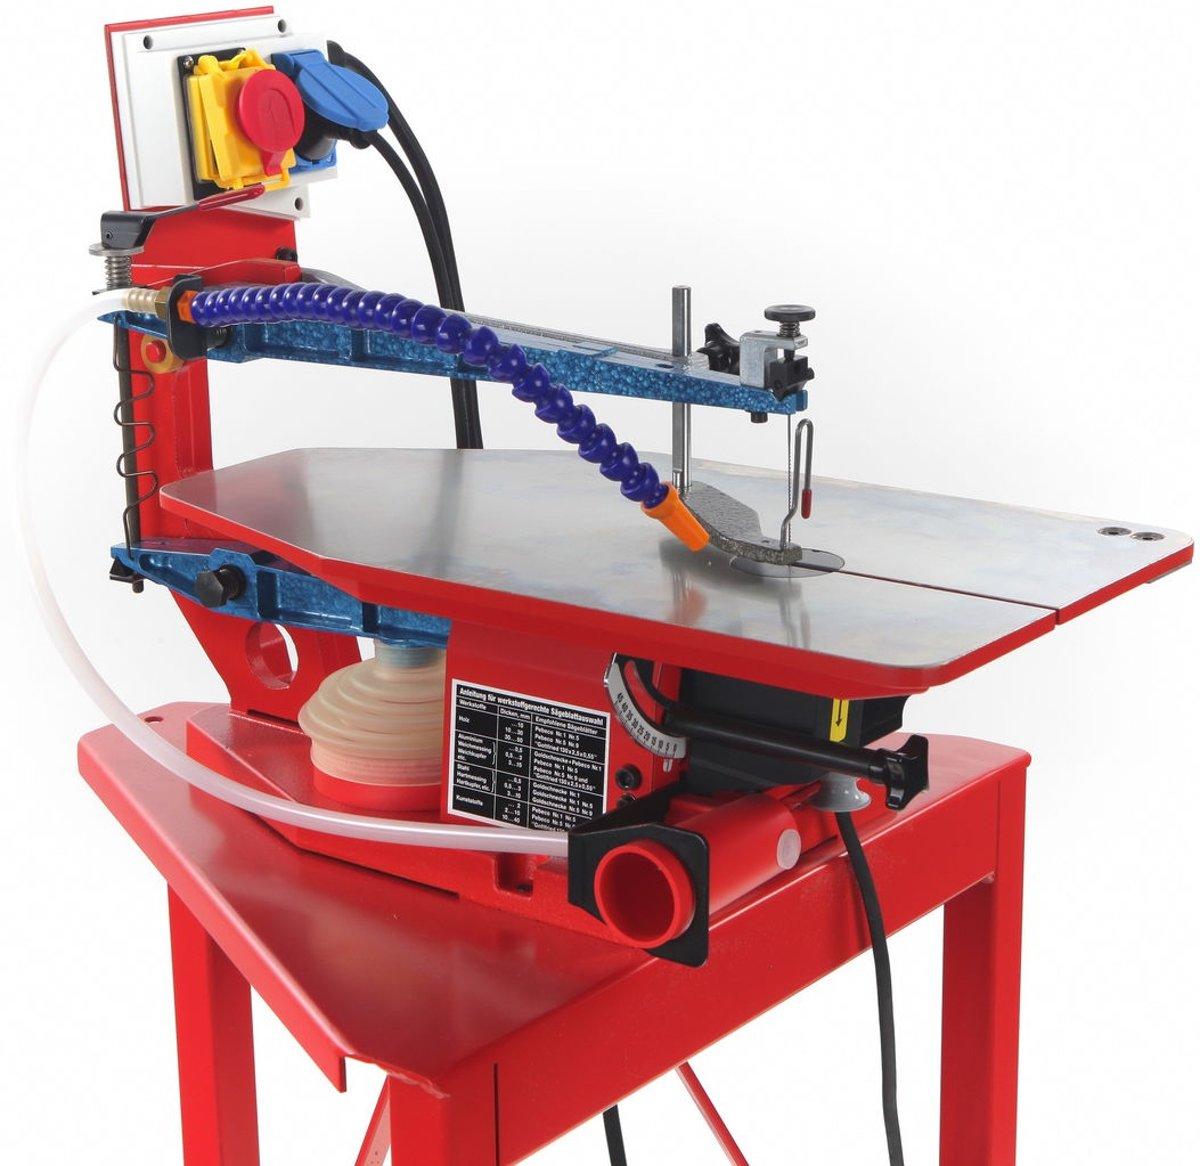 Hegner Multicut M1 Electronic Figuurzaagmachine kopen